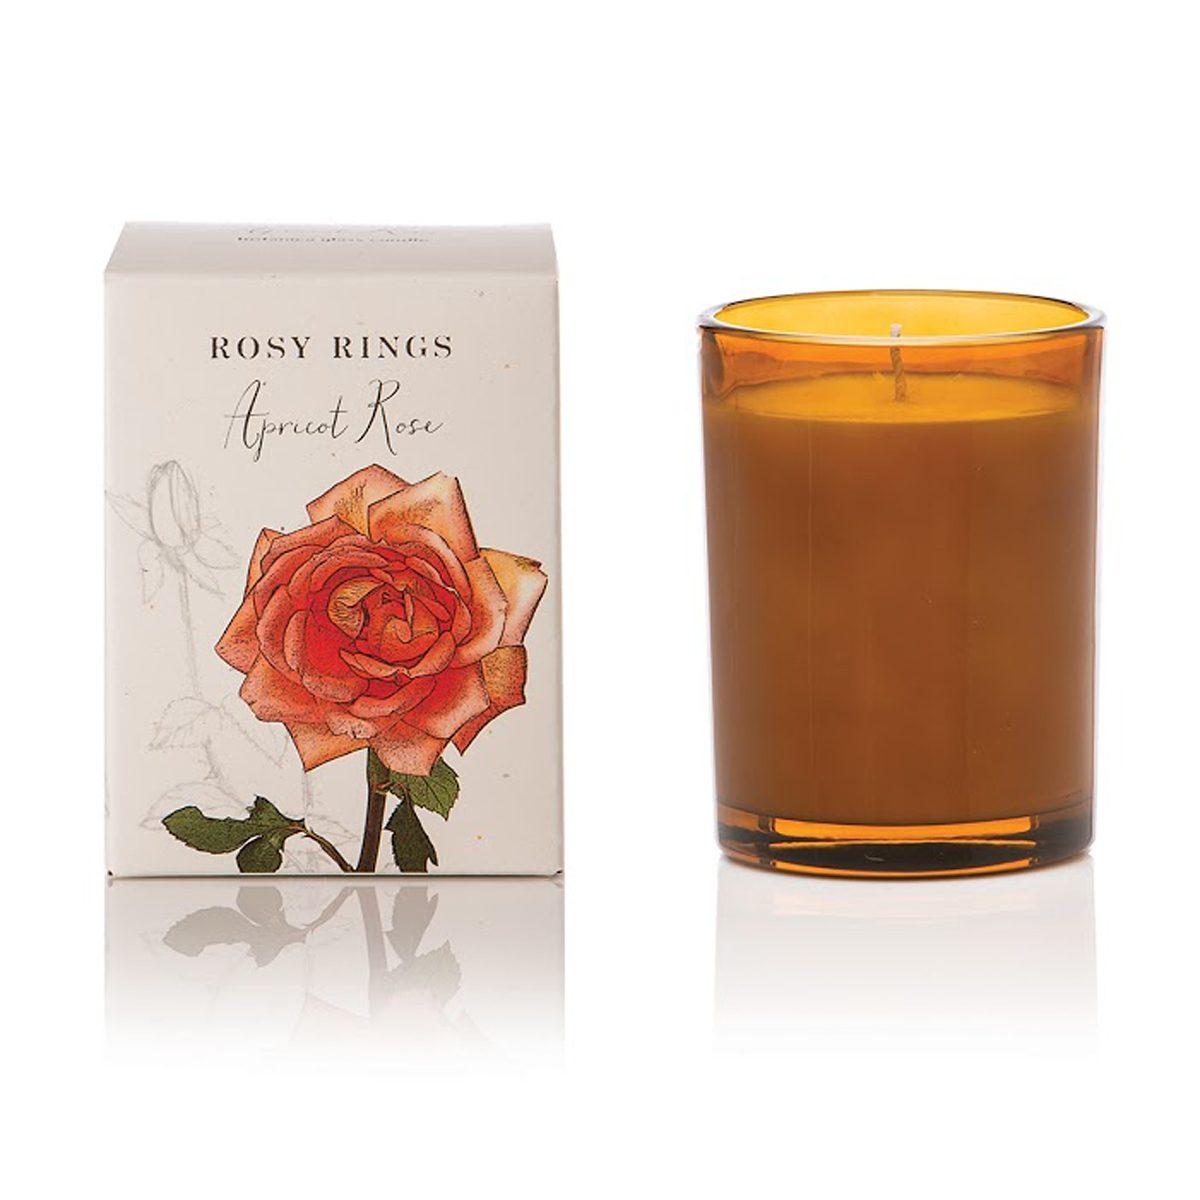 Rosy Rings Rosy Rings Duftkerze im Glas - Aprikose + Rose